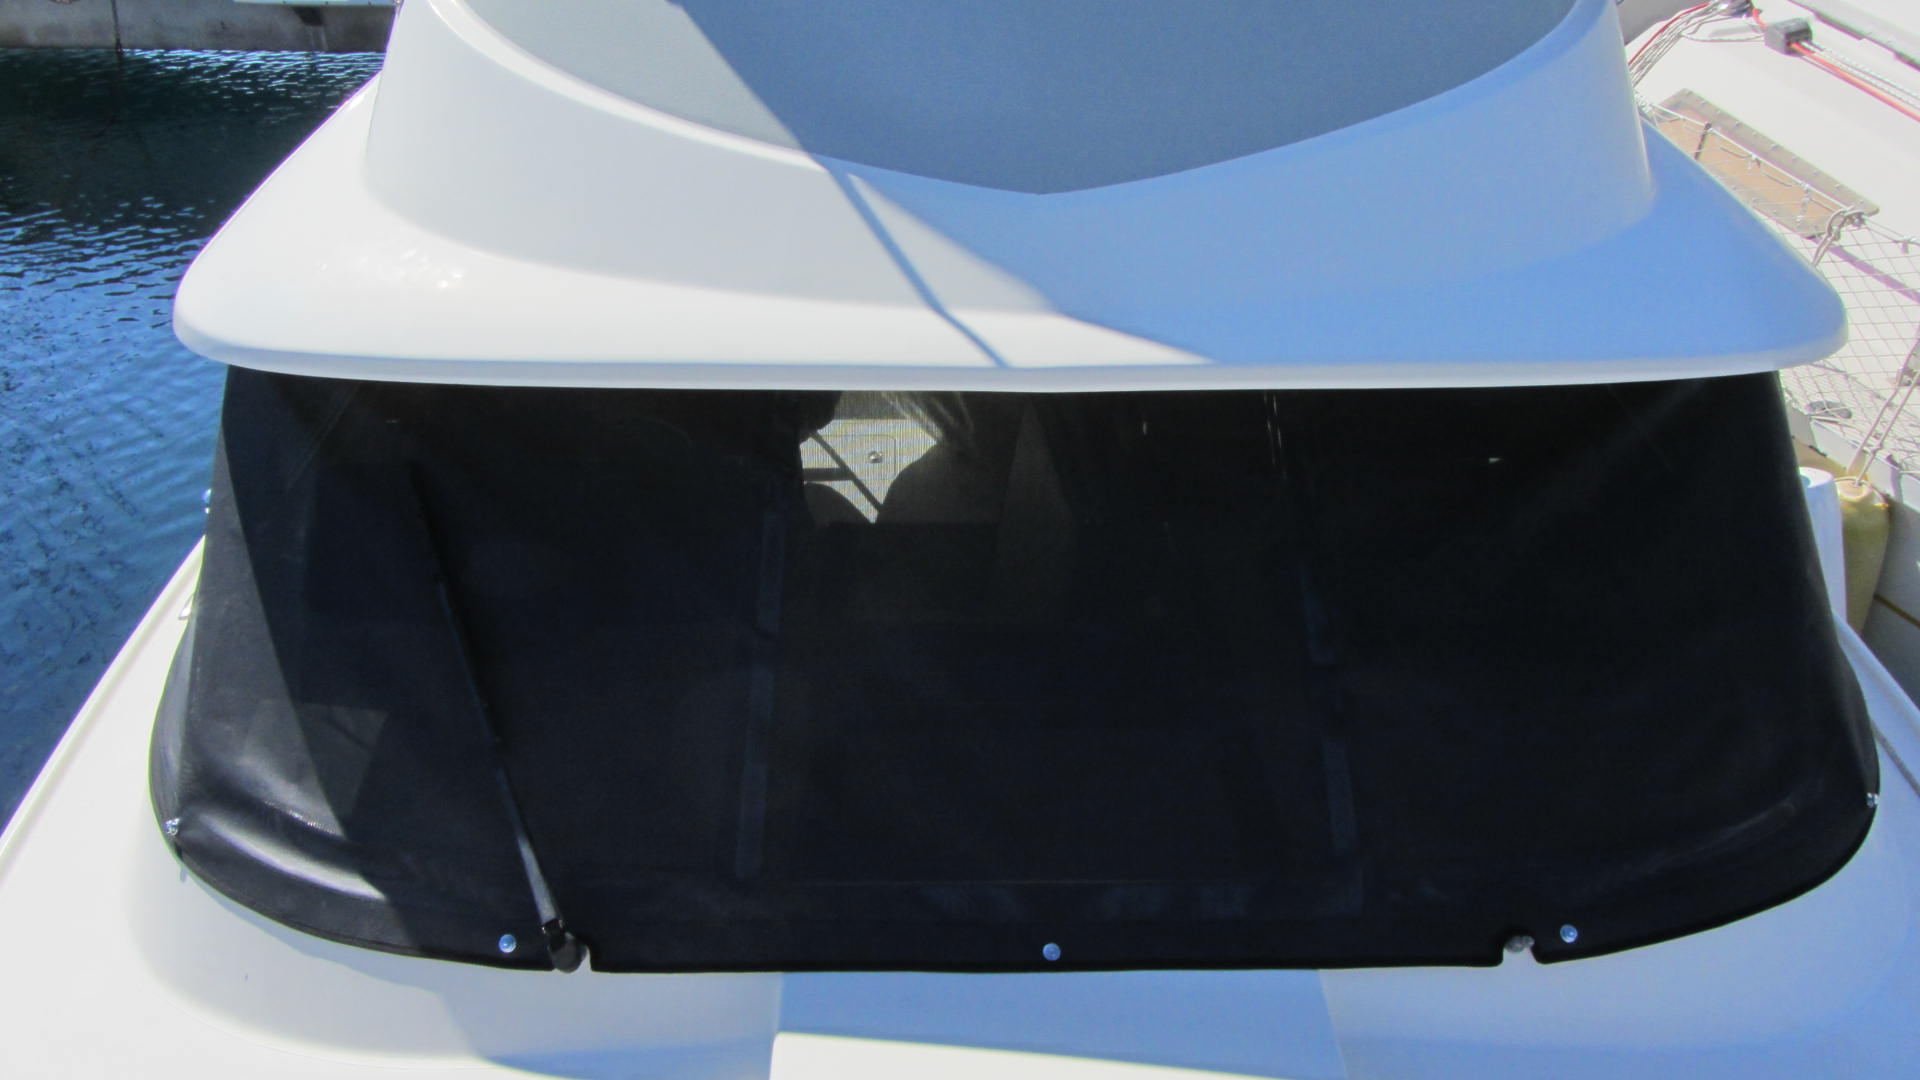 bimini taud protection soleil vente sellerie bateau ext rieur. Black Bedroom Furniture Sets. Home Design Ideas